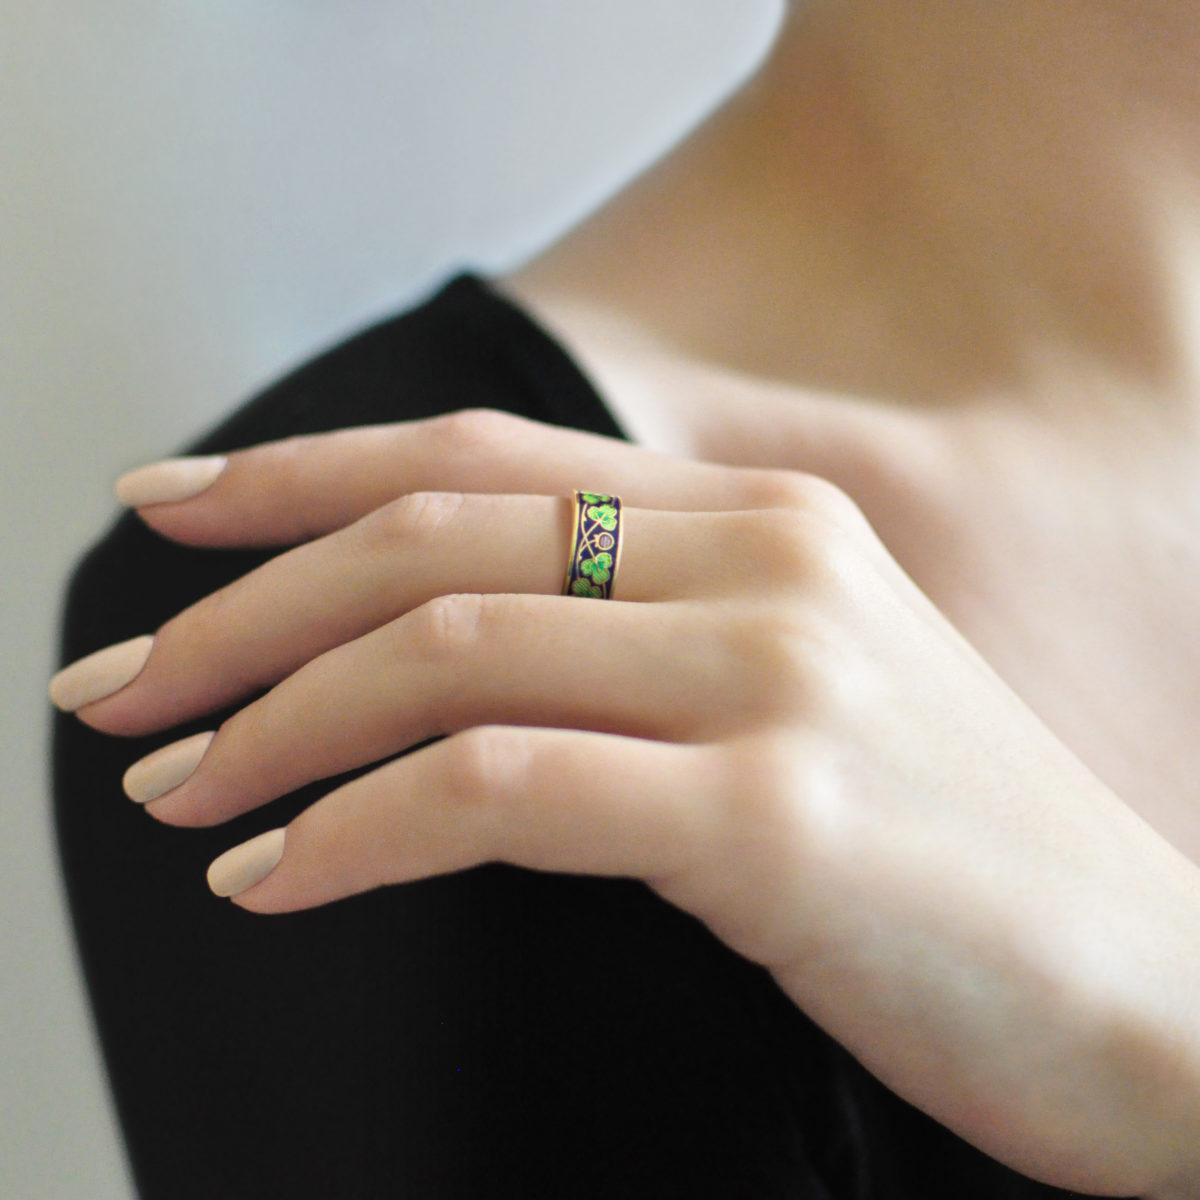 Zolochenie s zelenym 1200x1200 - Кольцо серебряное «Спас-на-крови» (золочение), зеленая